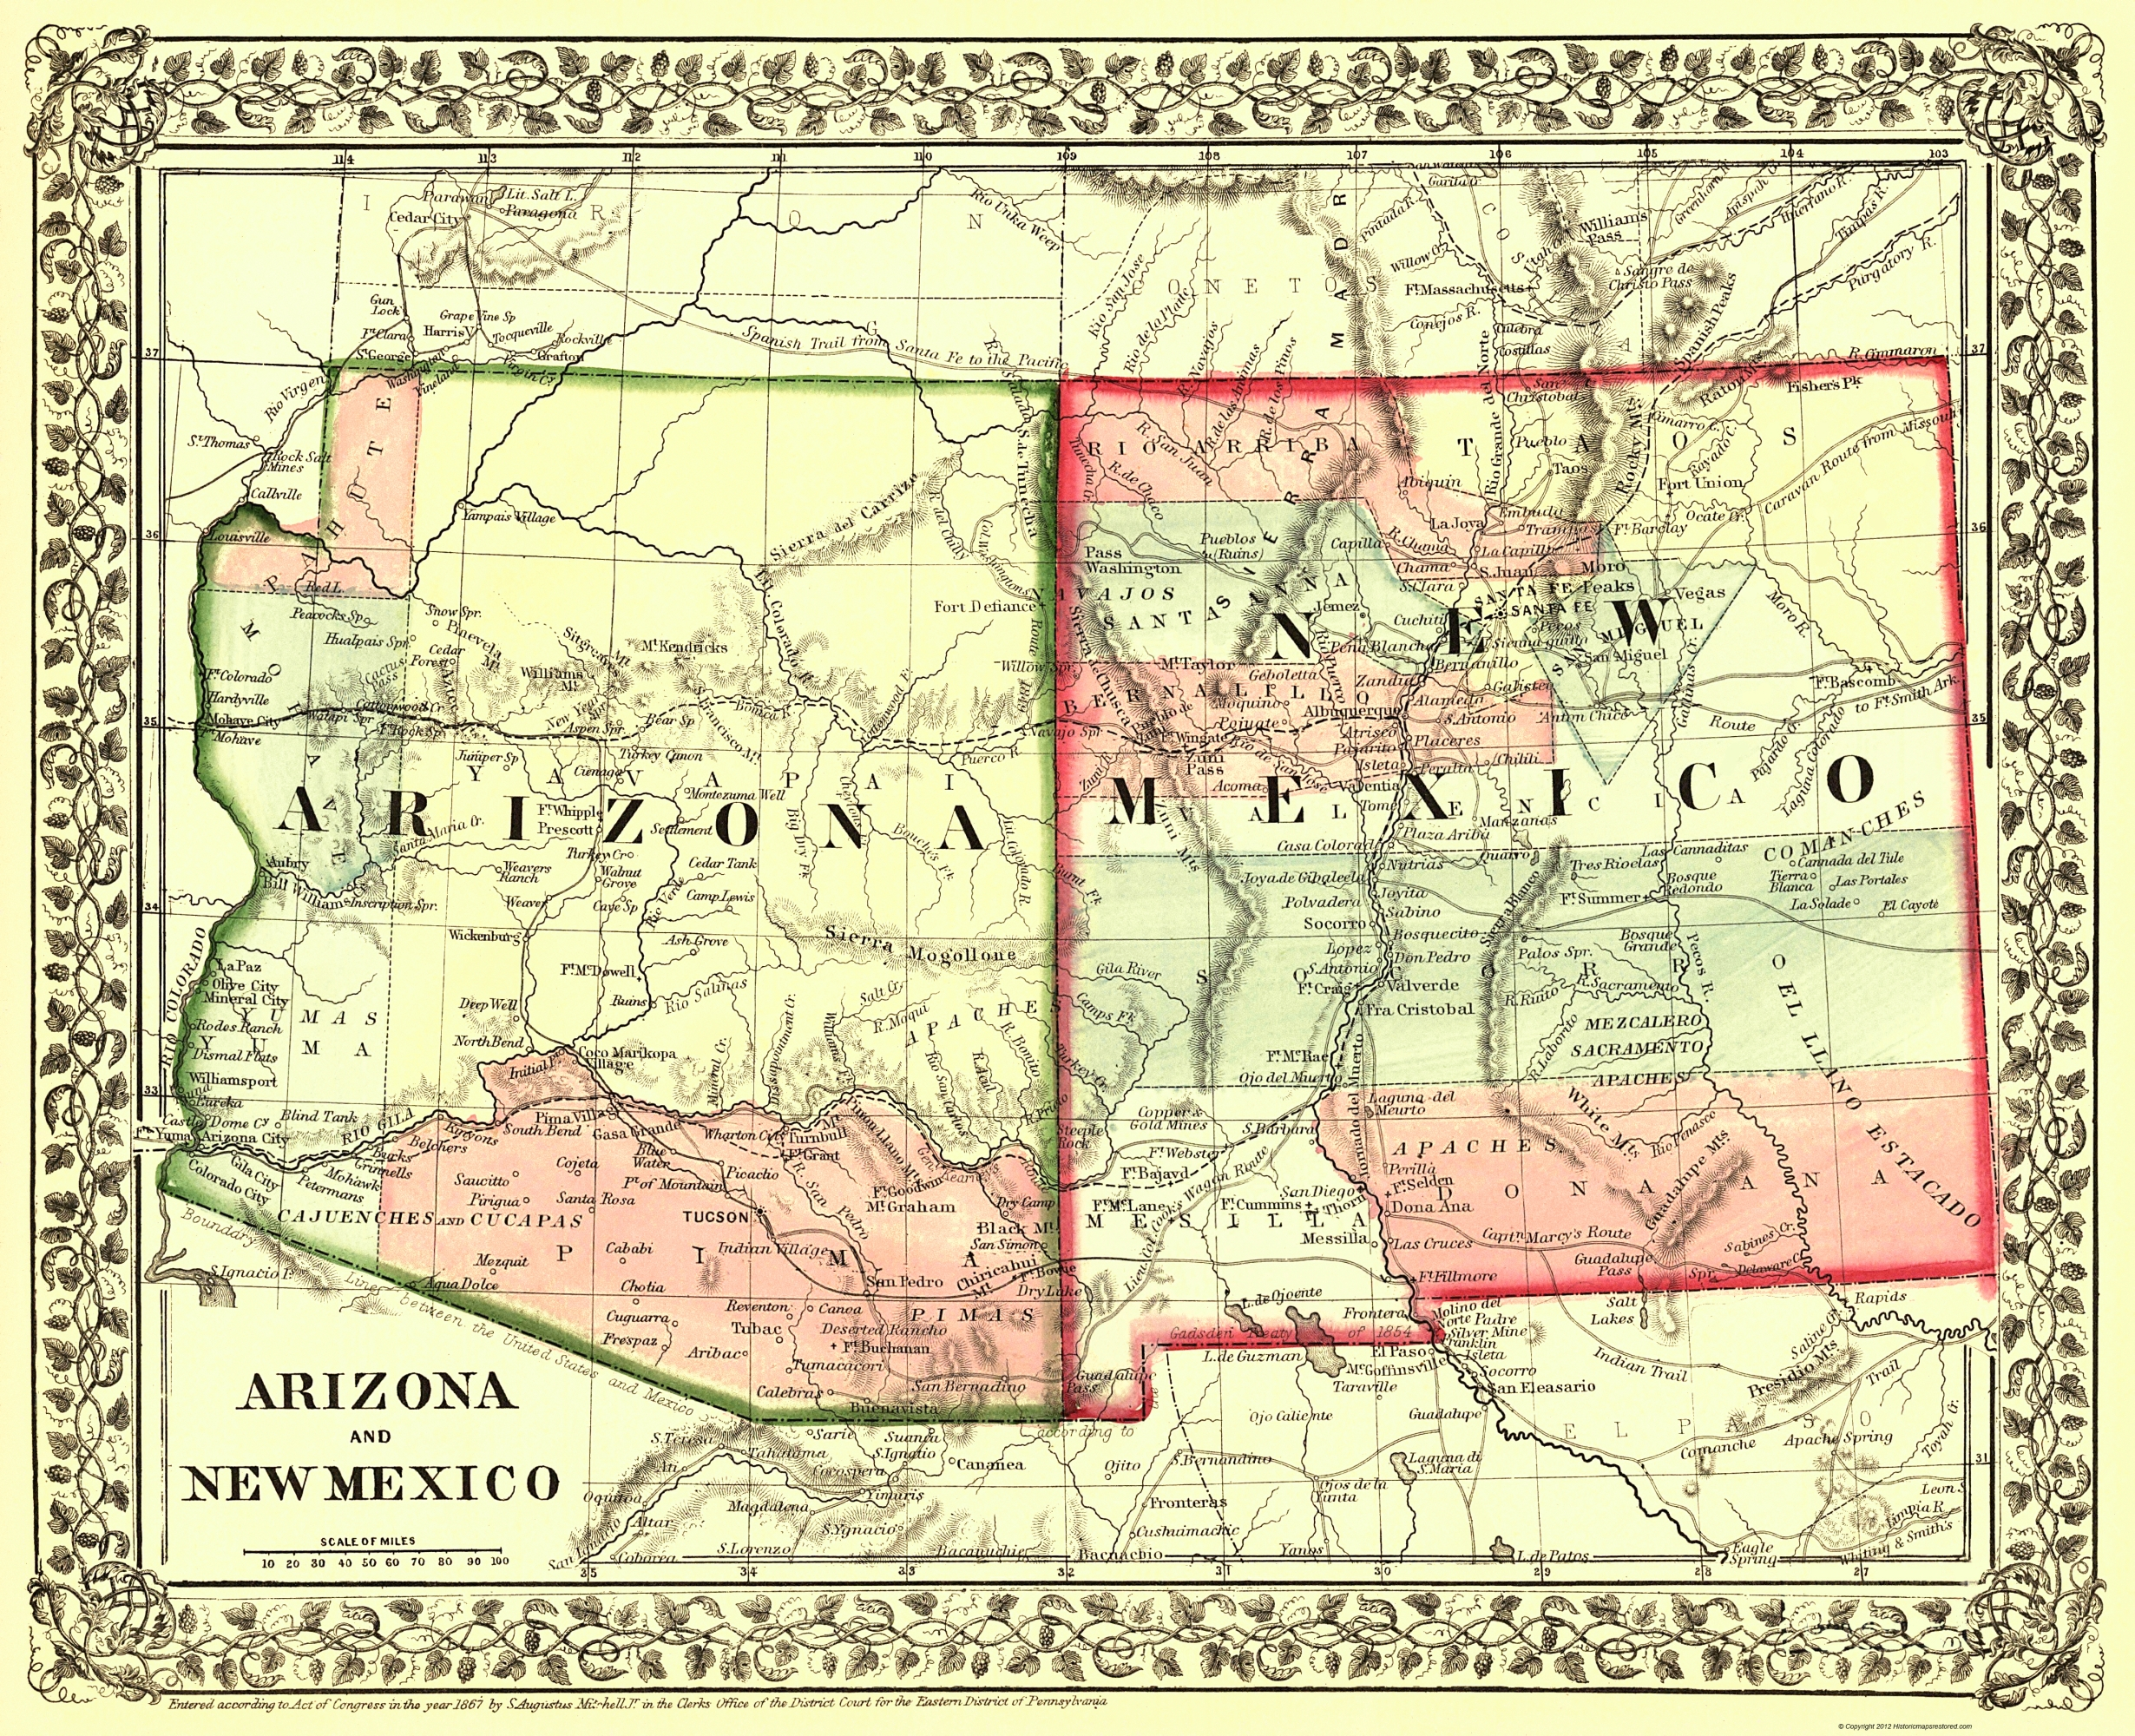 Arizona New Mexico Map Old State Map   Arizona, New Mexico   Mitchell 1867